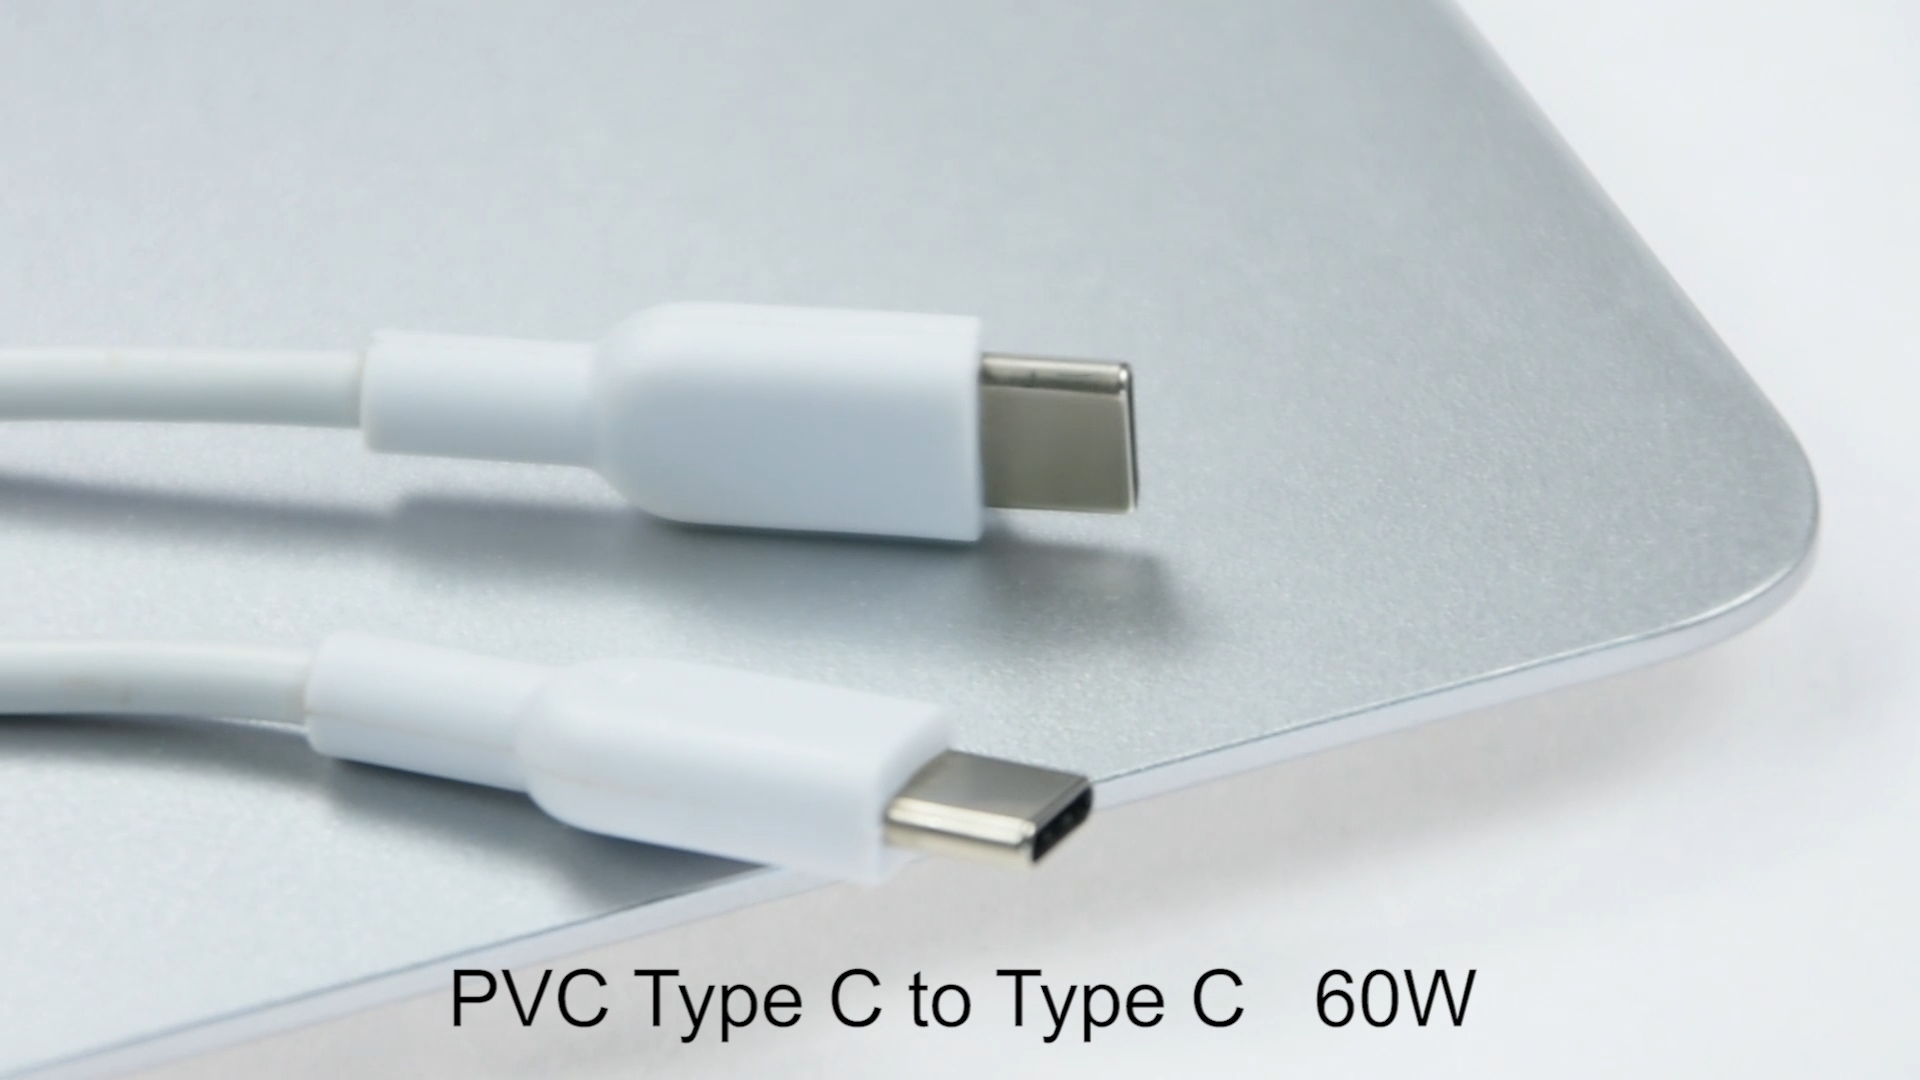 1Meter 2 Meter 3 Meter OEM Micro USB Ladegerät Kabel Android Handy Daten Sync Kabel Für Samsung USB ladekabel